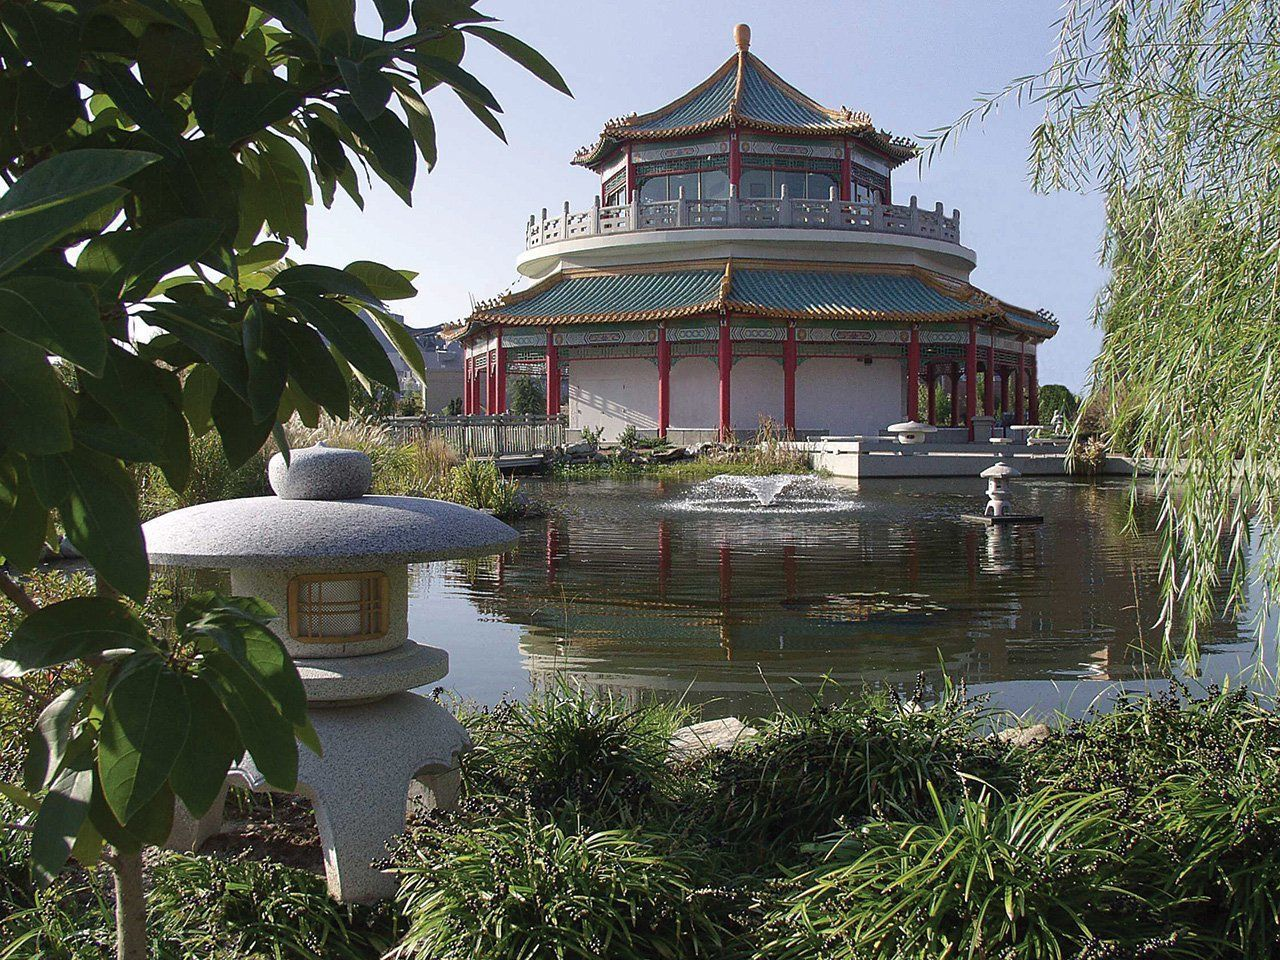 Norfolk Pagoda Pagoda garden, Pagoda, Norfolk virginia